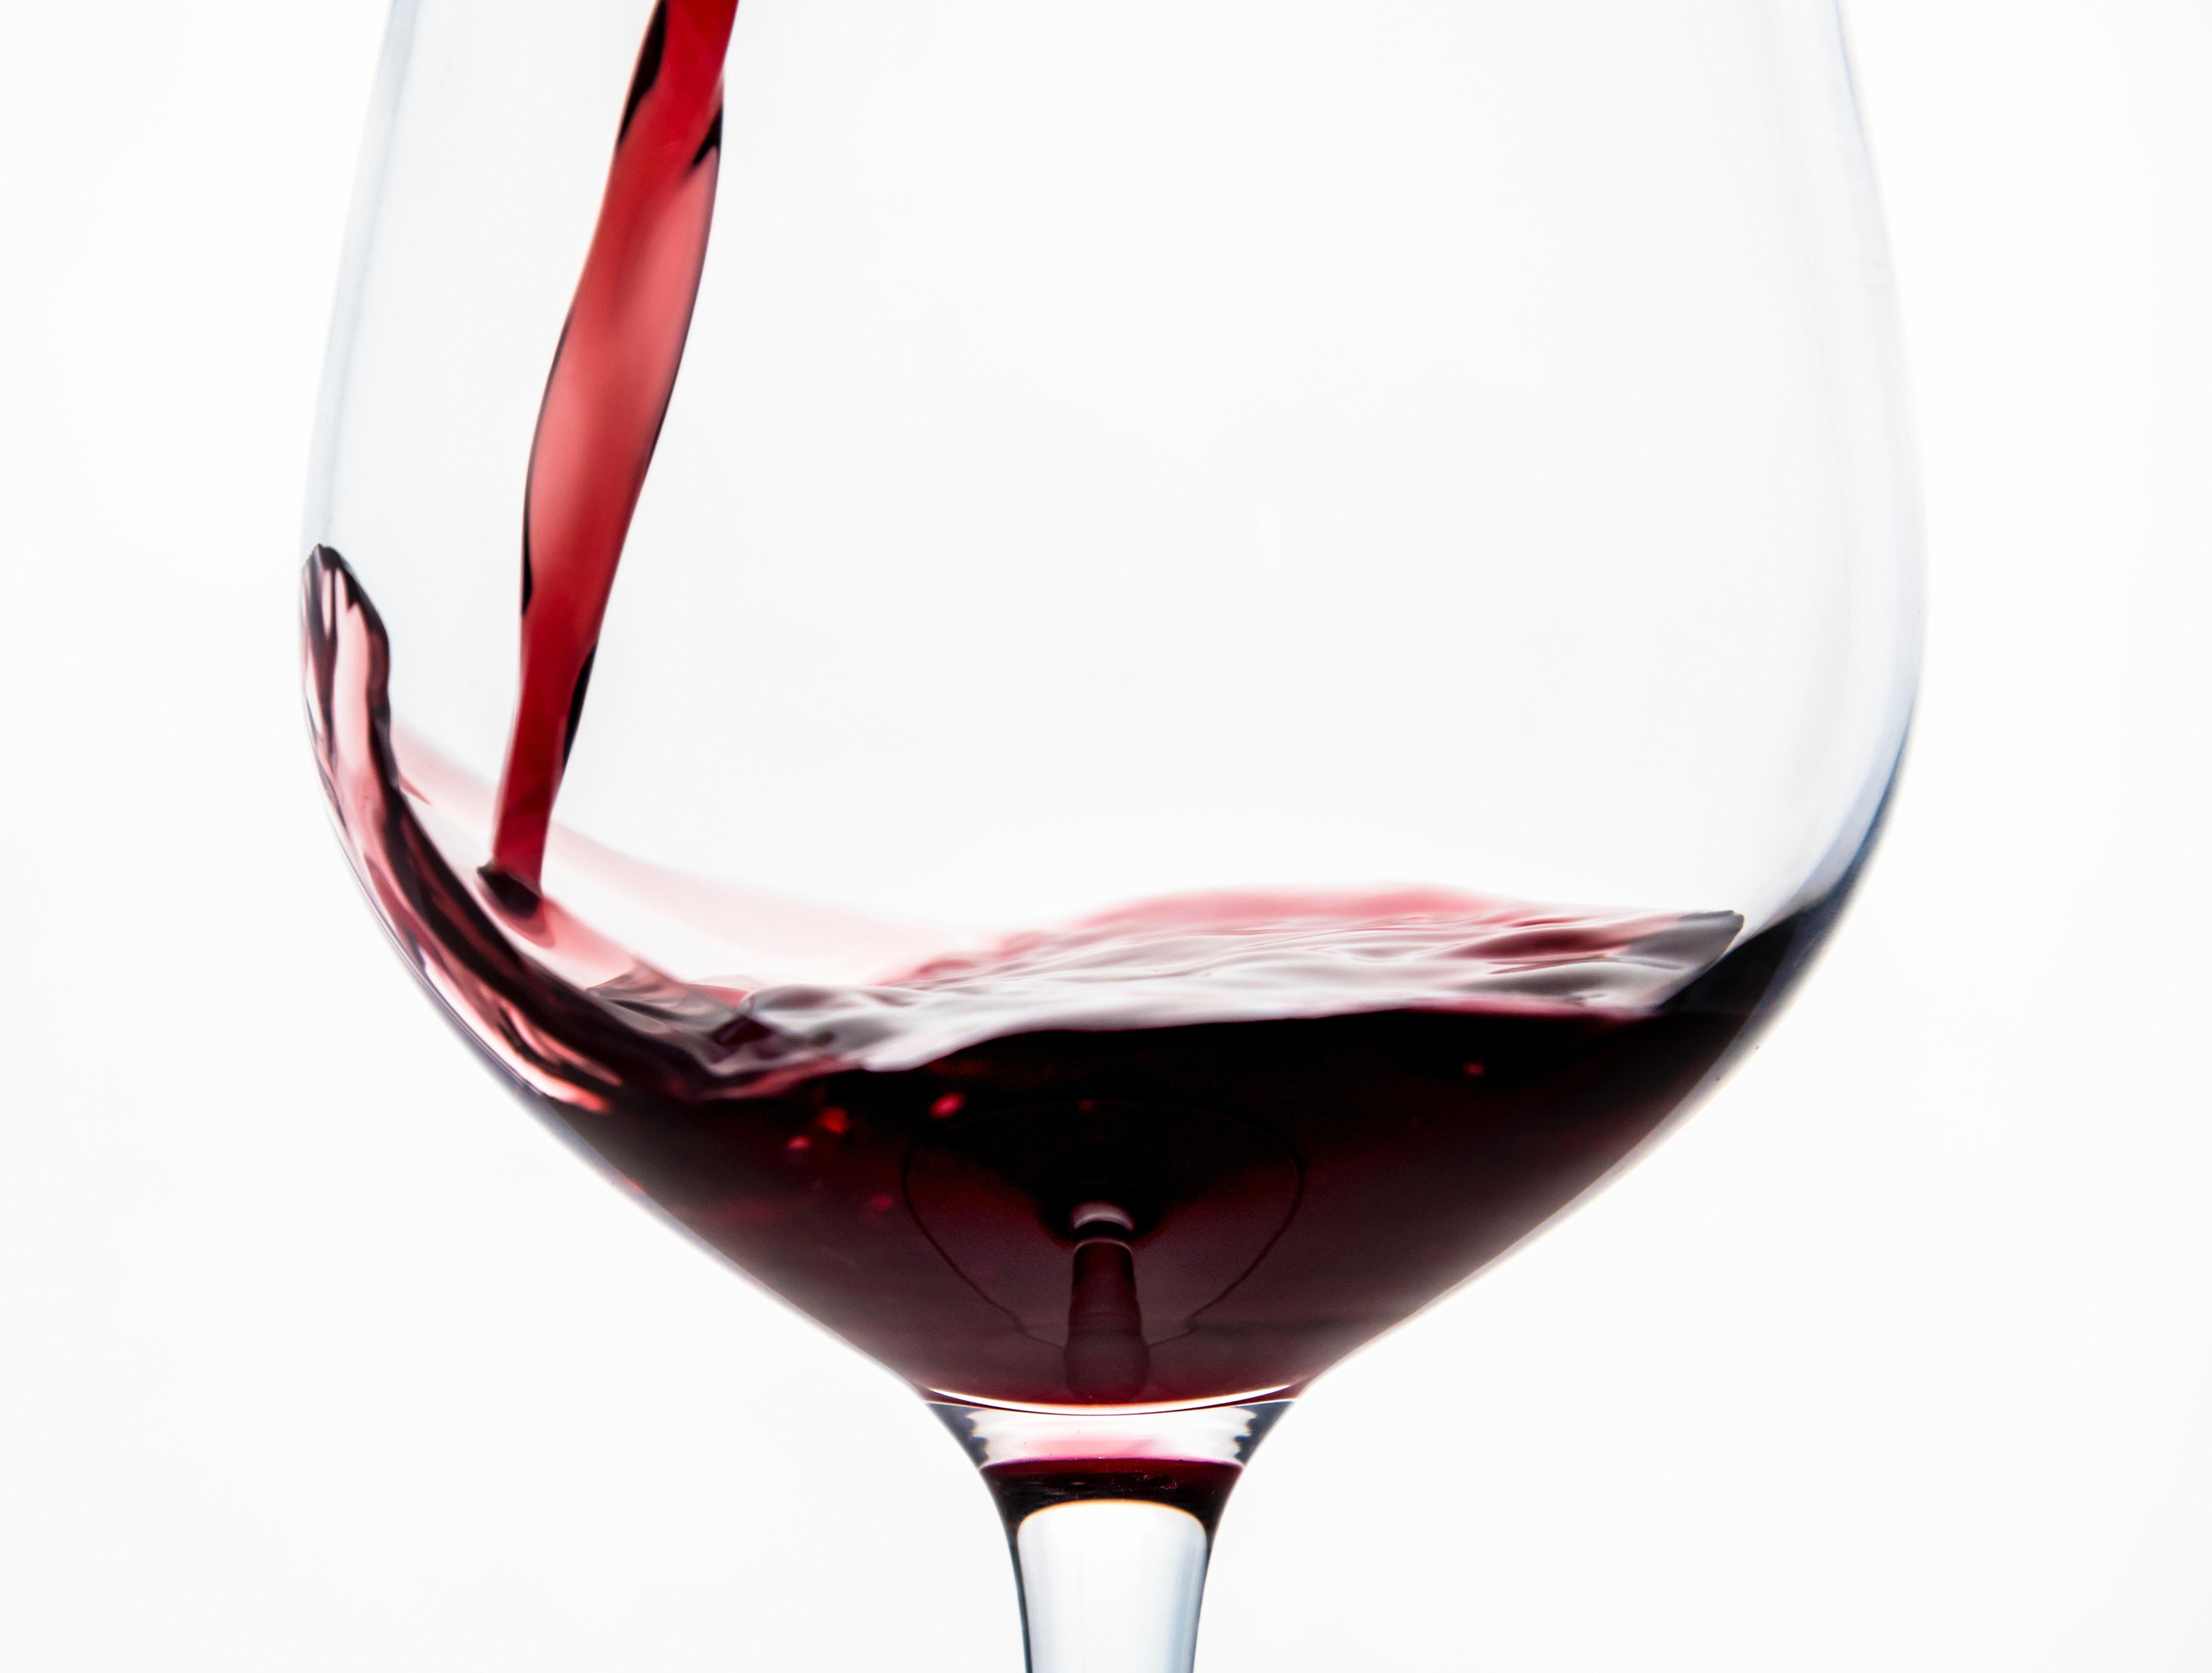 alcoholic-beverage-beverage-close-up-